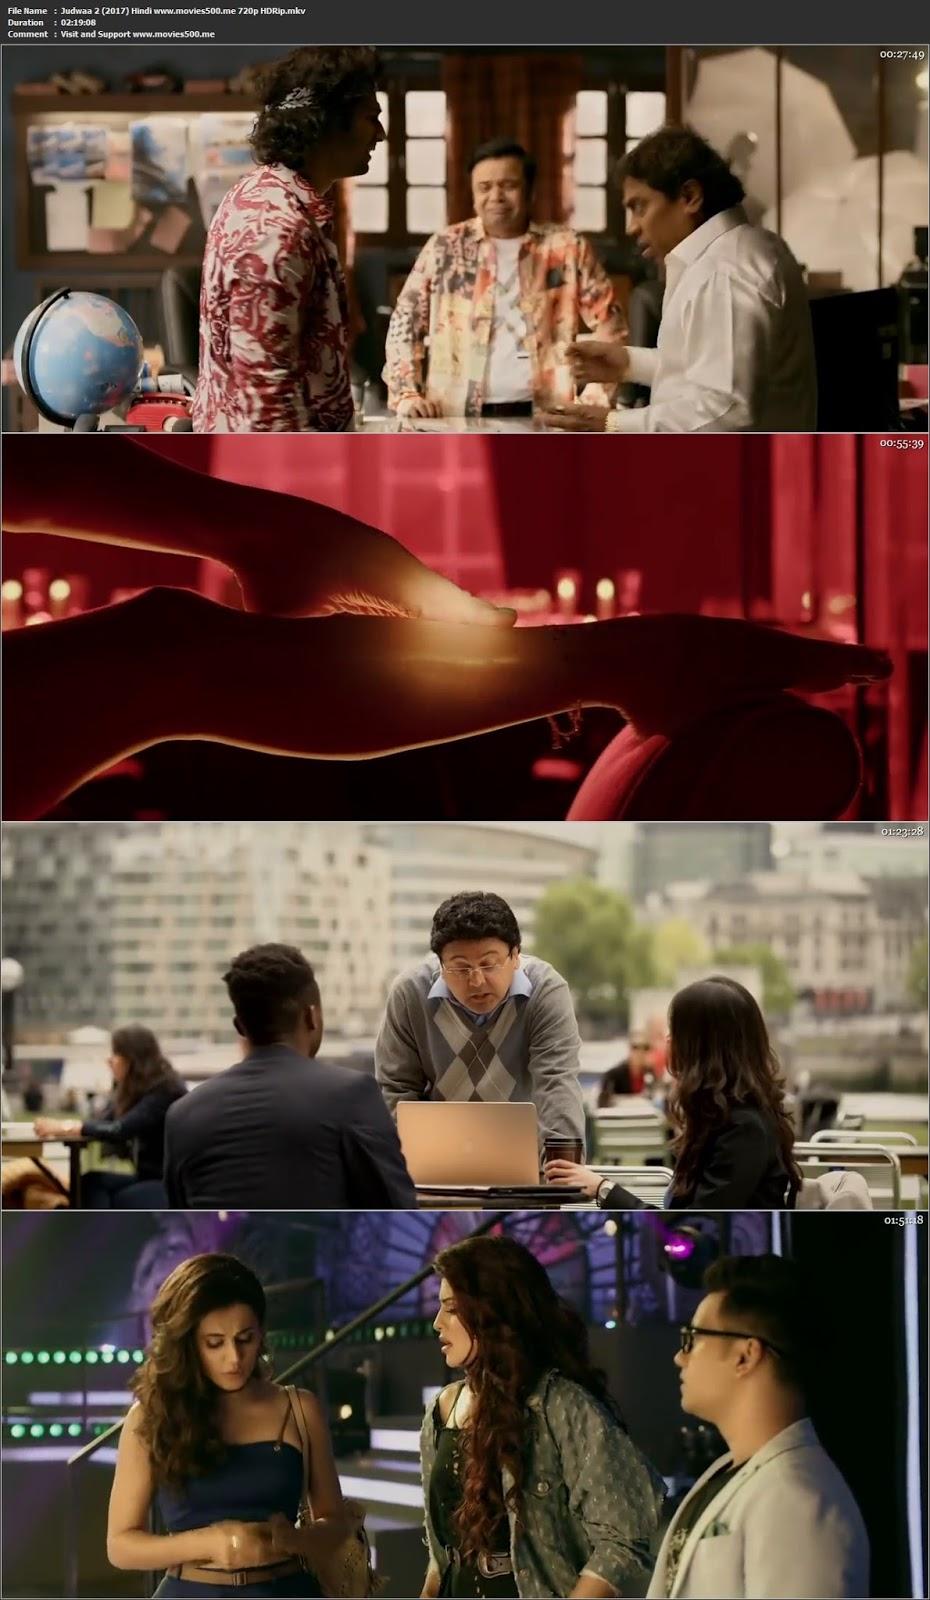 Judwaa 2 2017 Hindi Full Movie HDRip 720p 1GB at mualfa.net